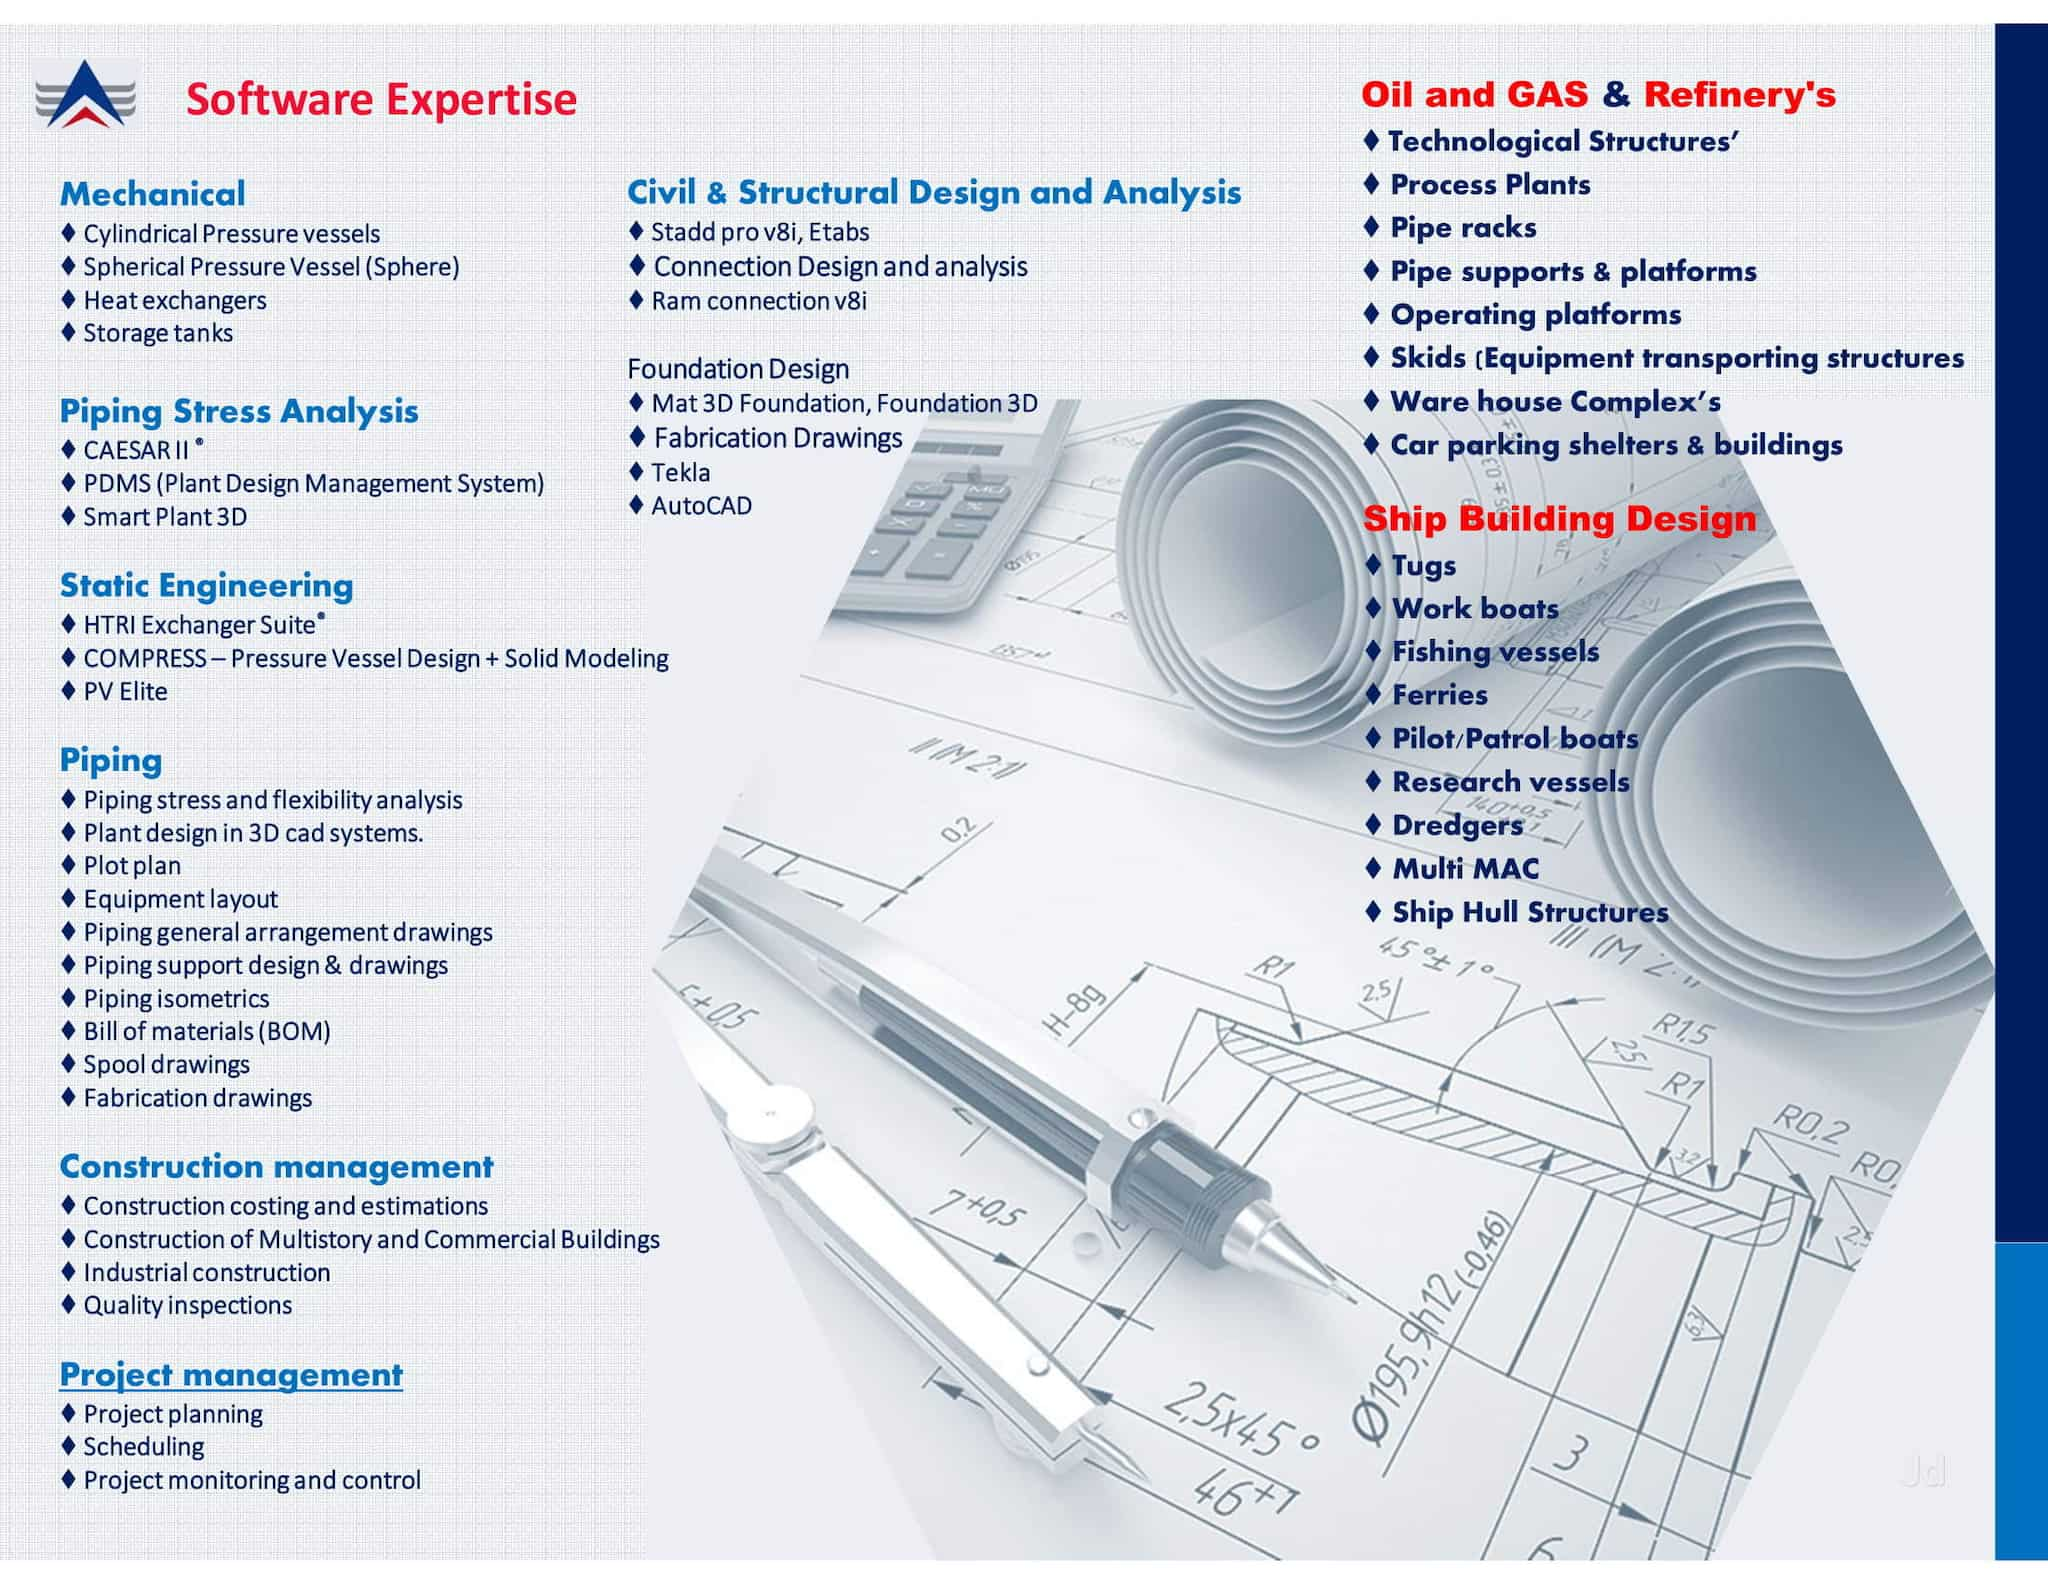 Oil Storage Tank Foundation Design